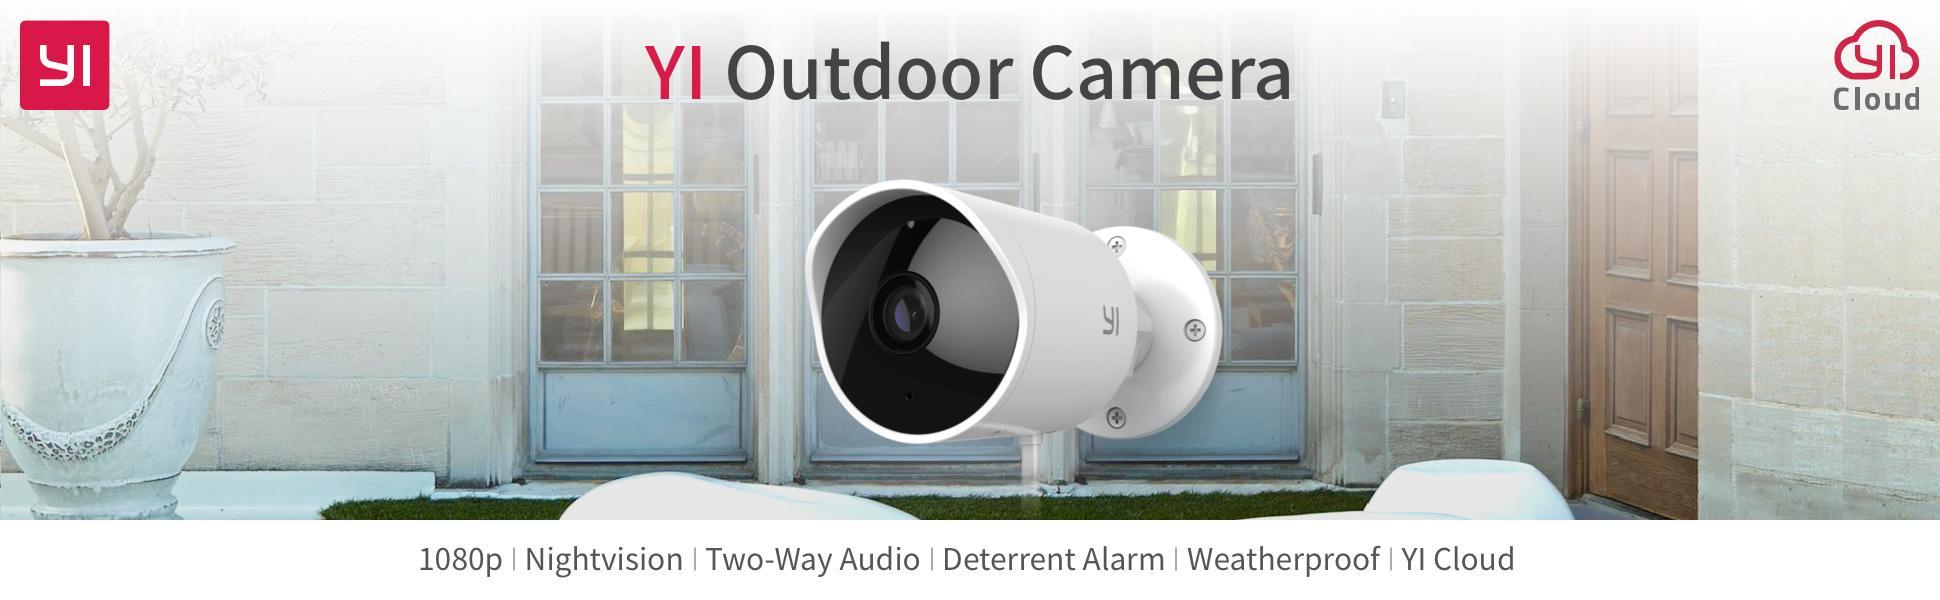 YI Outdoor Security Camera, 1080p Cloud - TiendaMIA com